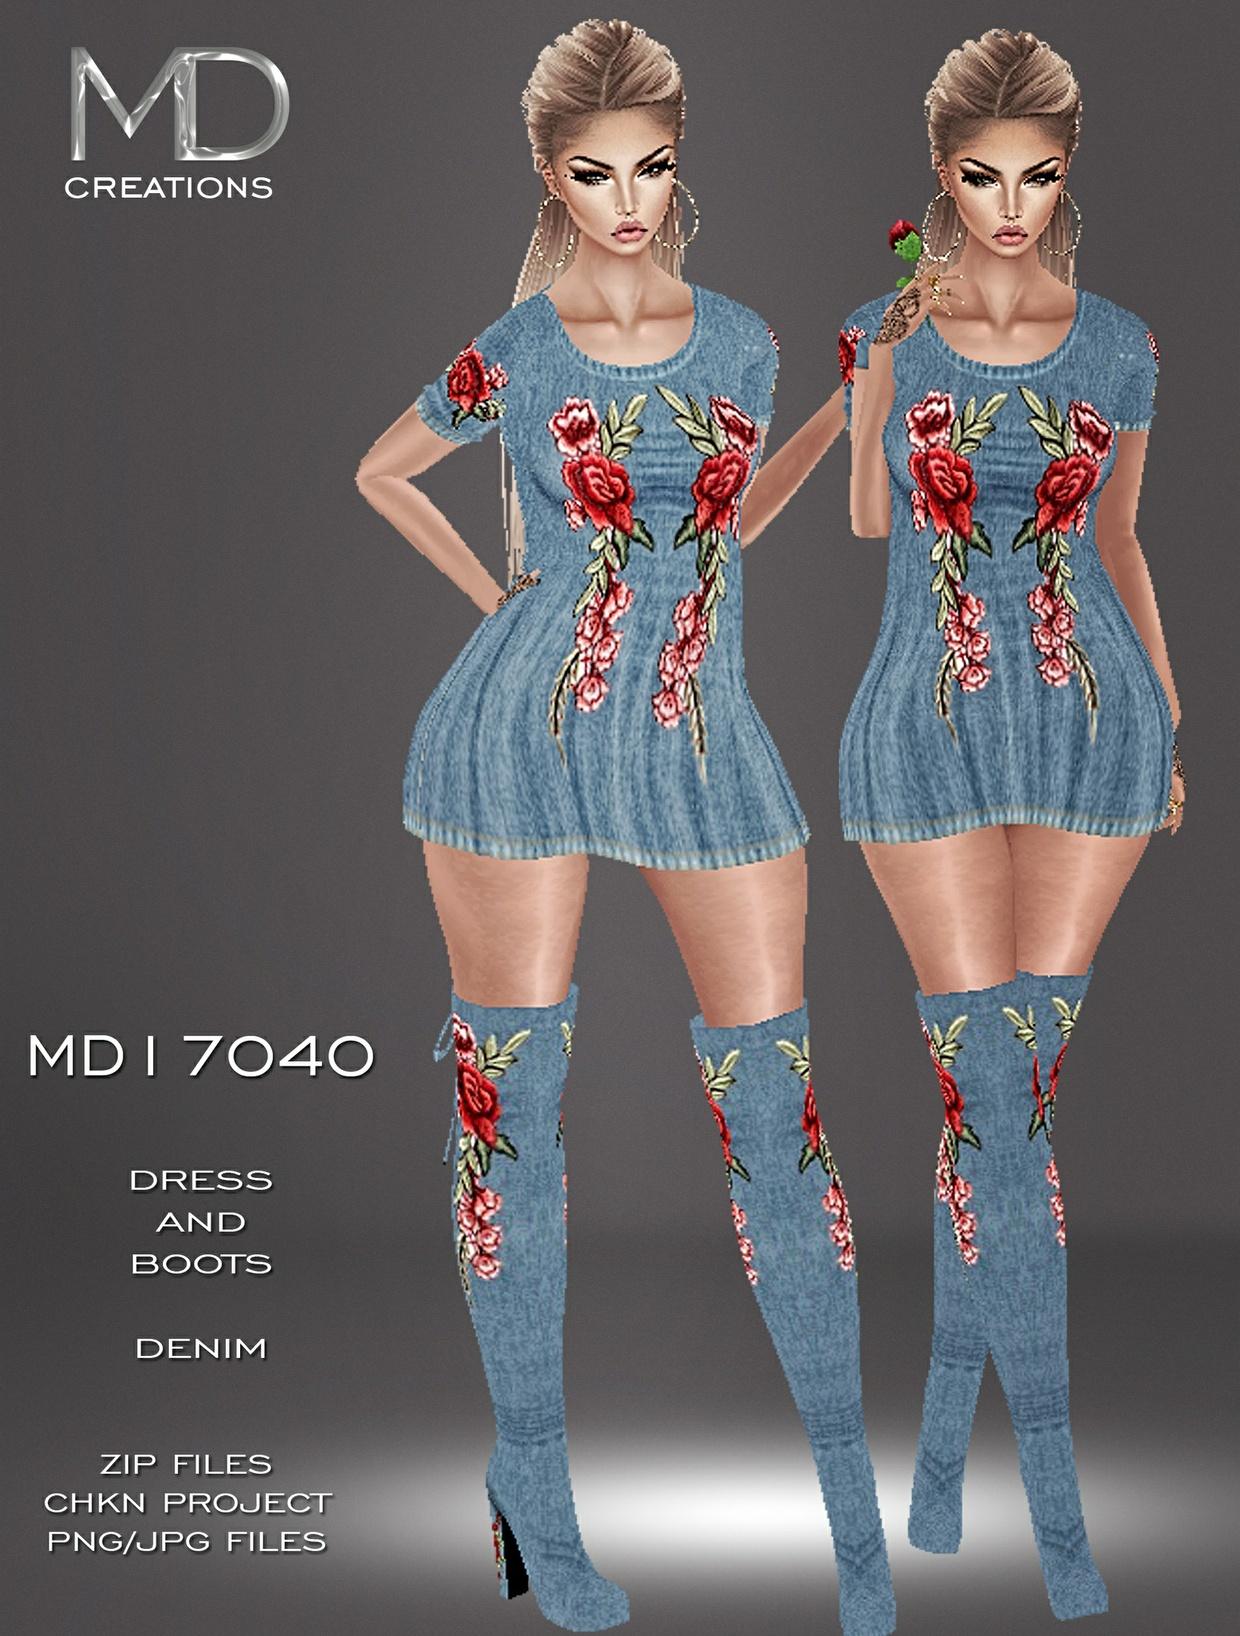 MD17040